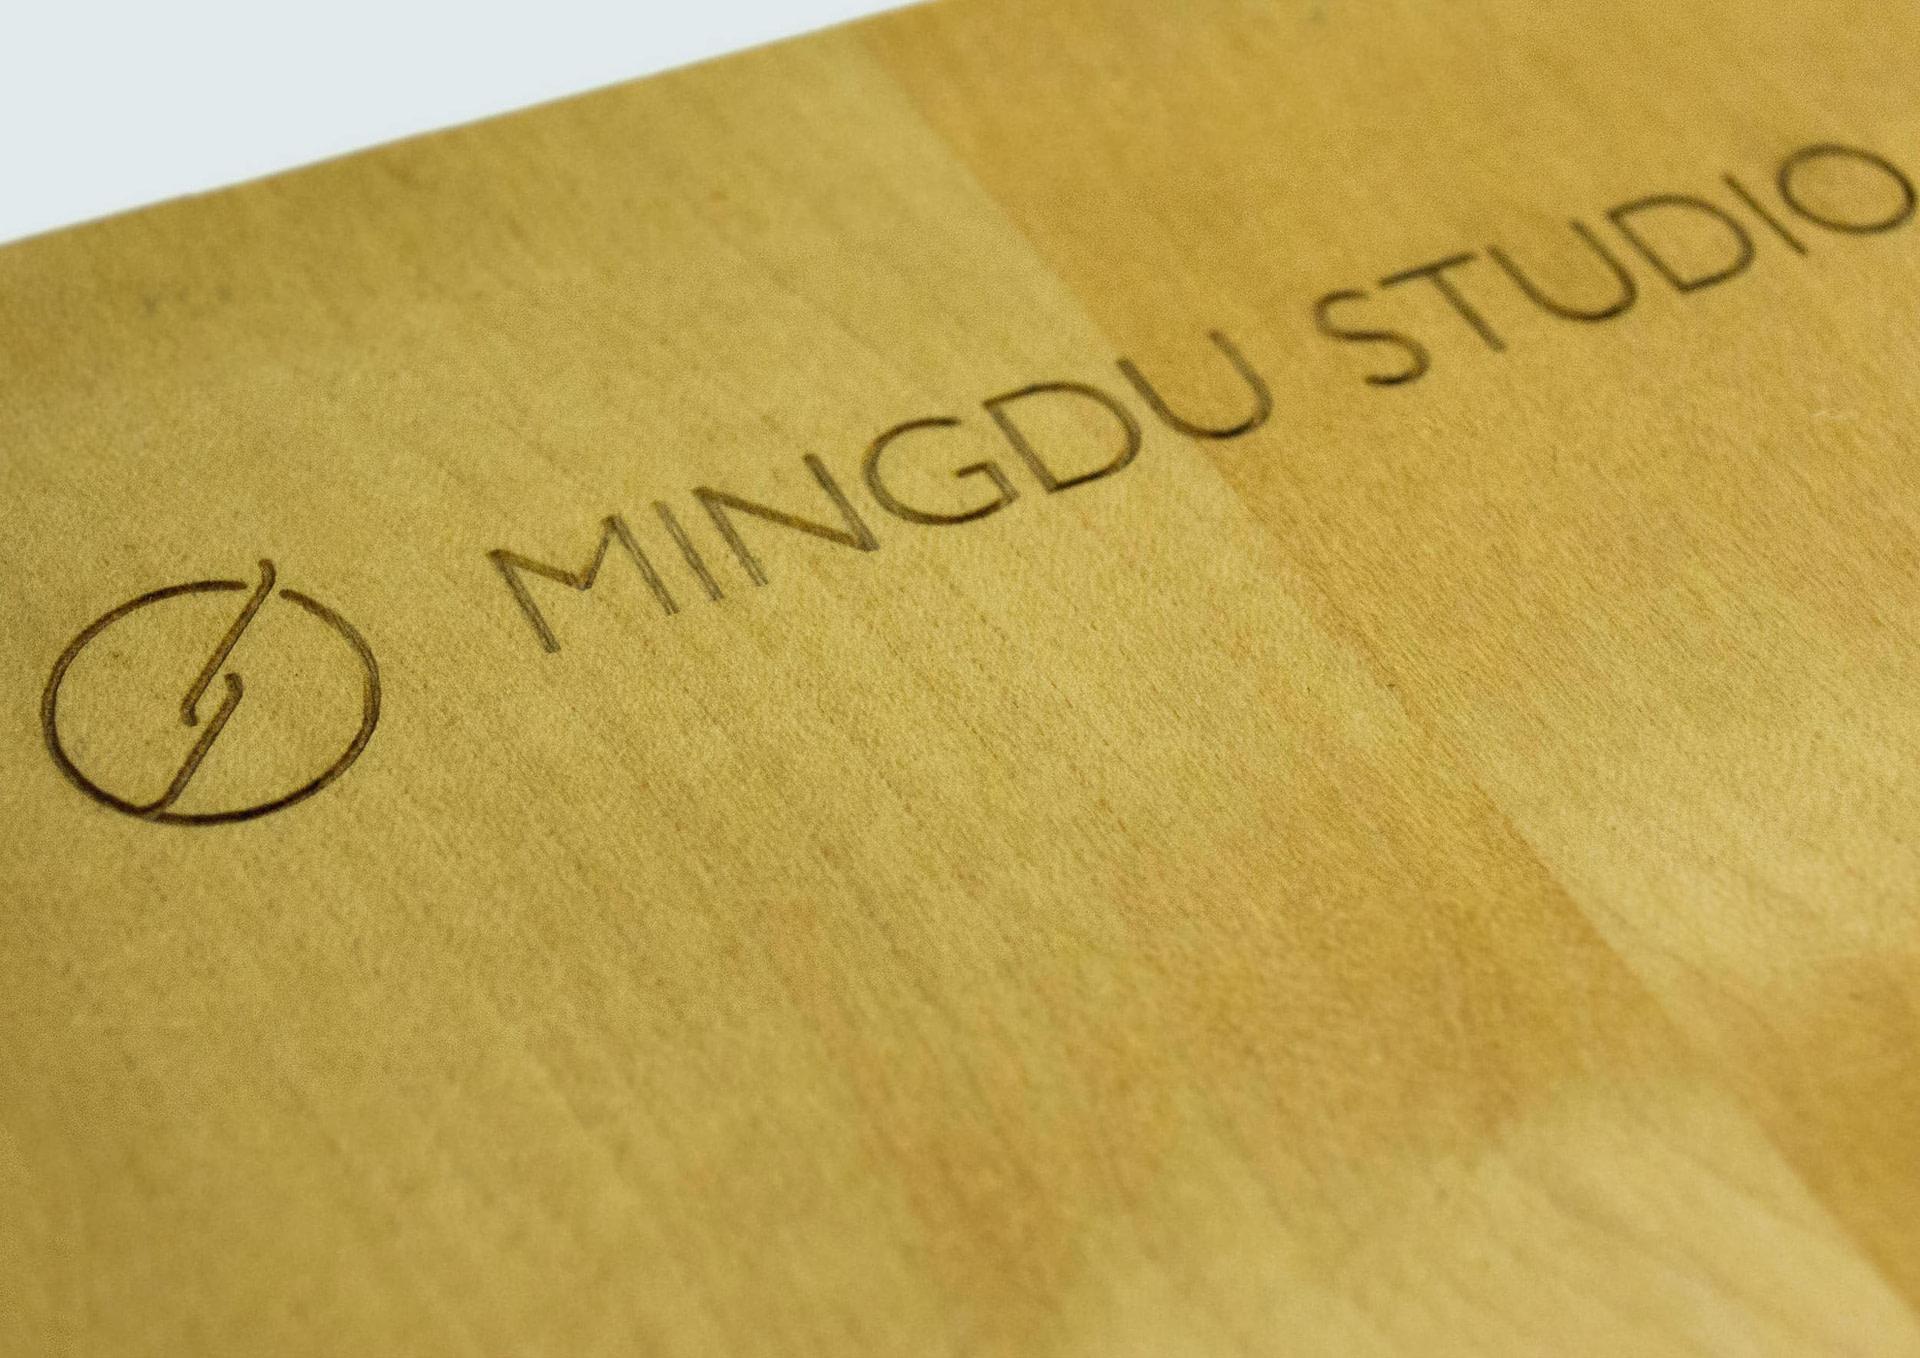 MINGDU STUDIO VI DESIGN 11